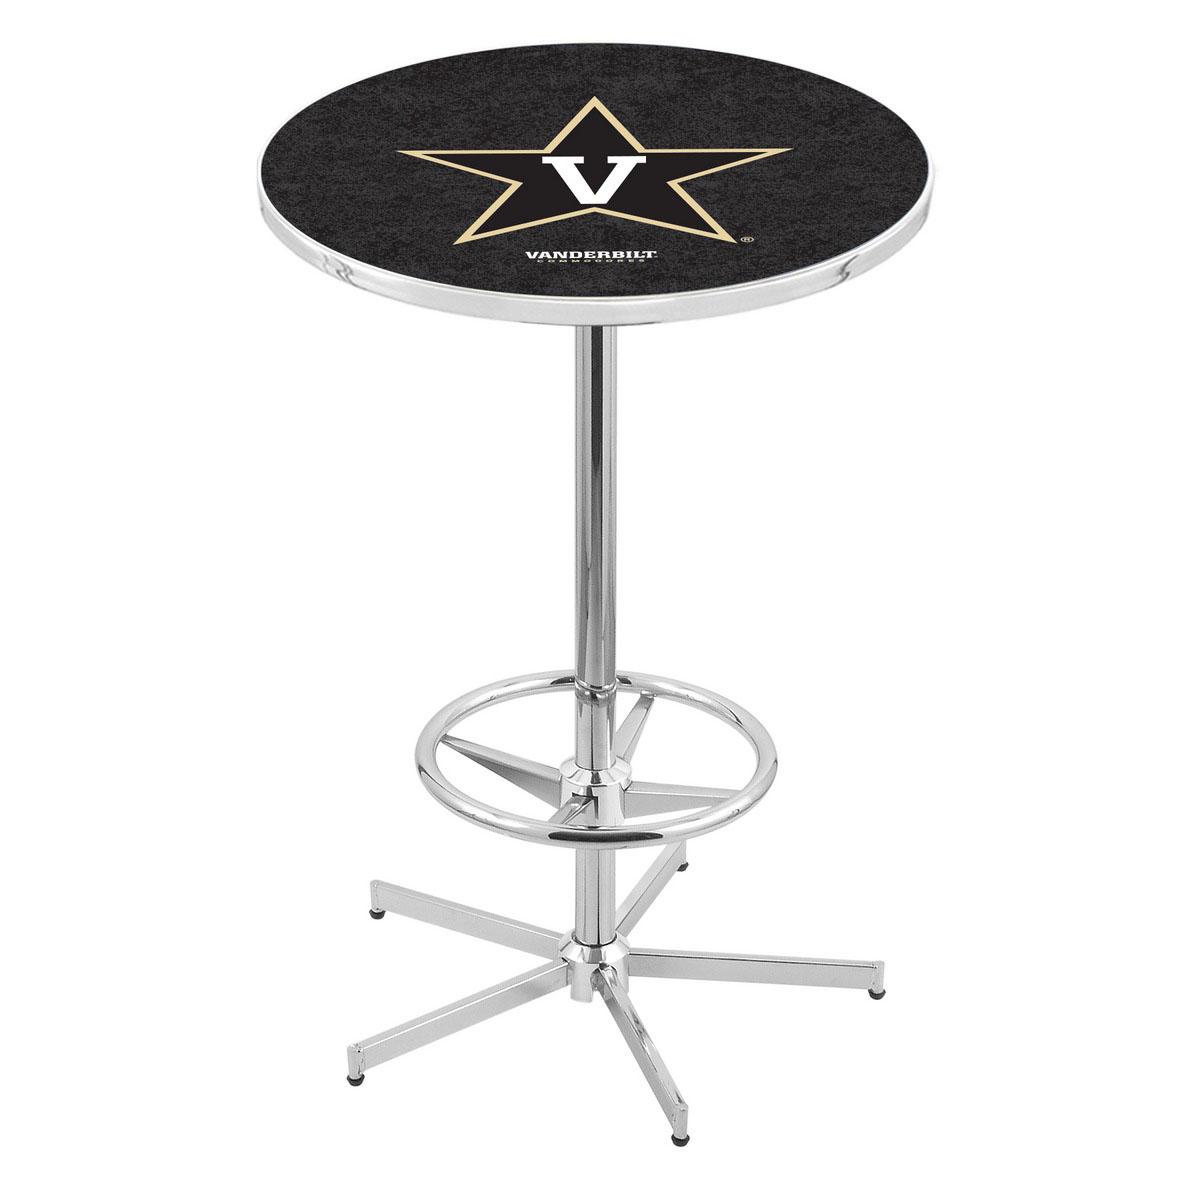 Choose Chrome Vanderbilt Pub Table Product Photo